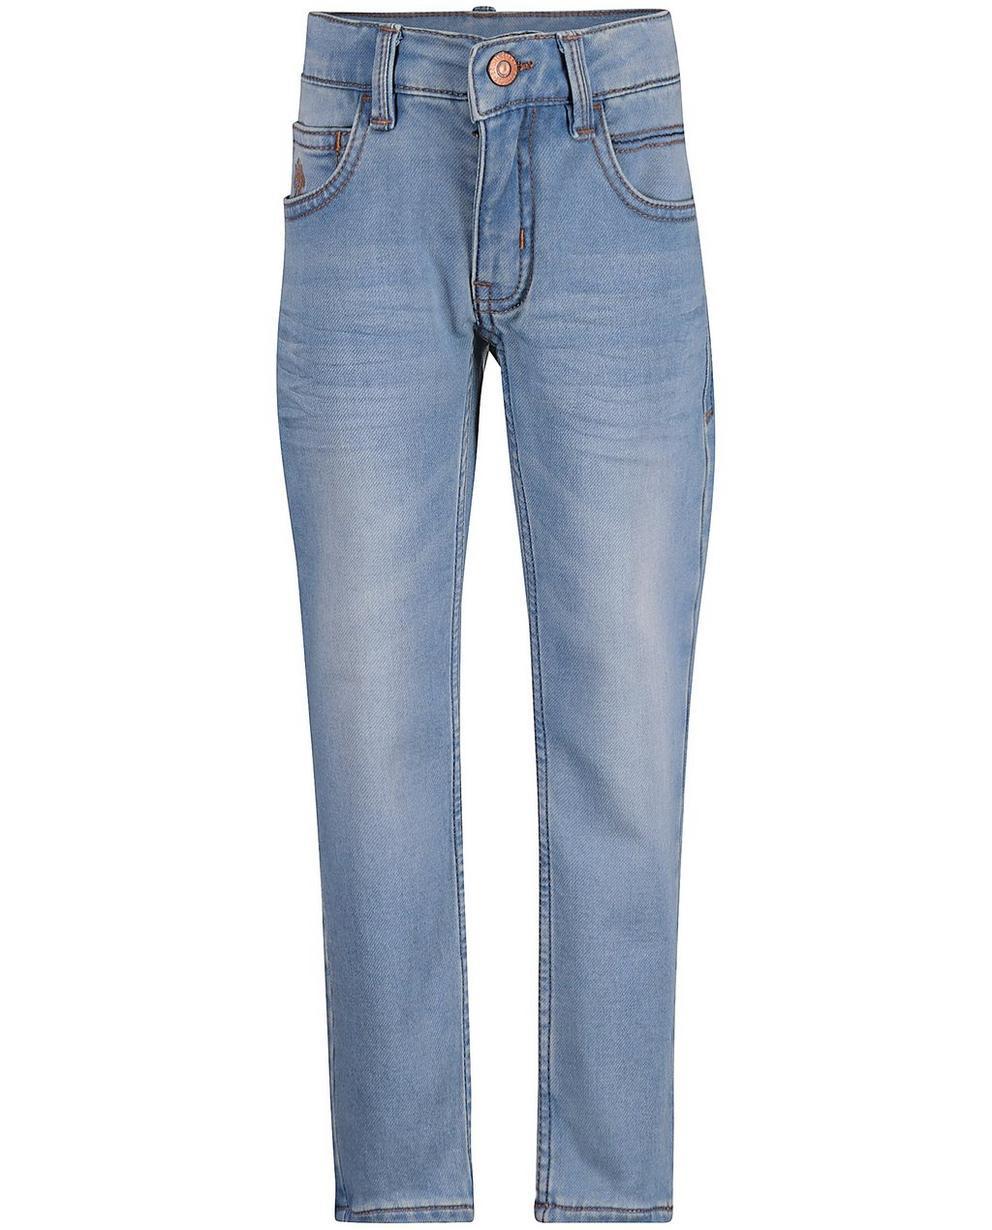 Hellblaue Slim-Jeans - Sweat Denim - JBC